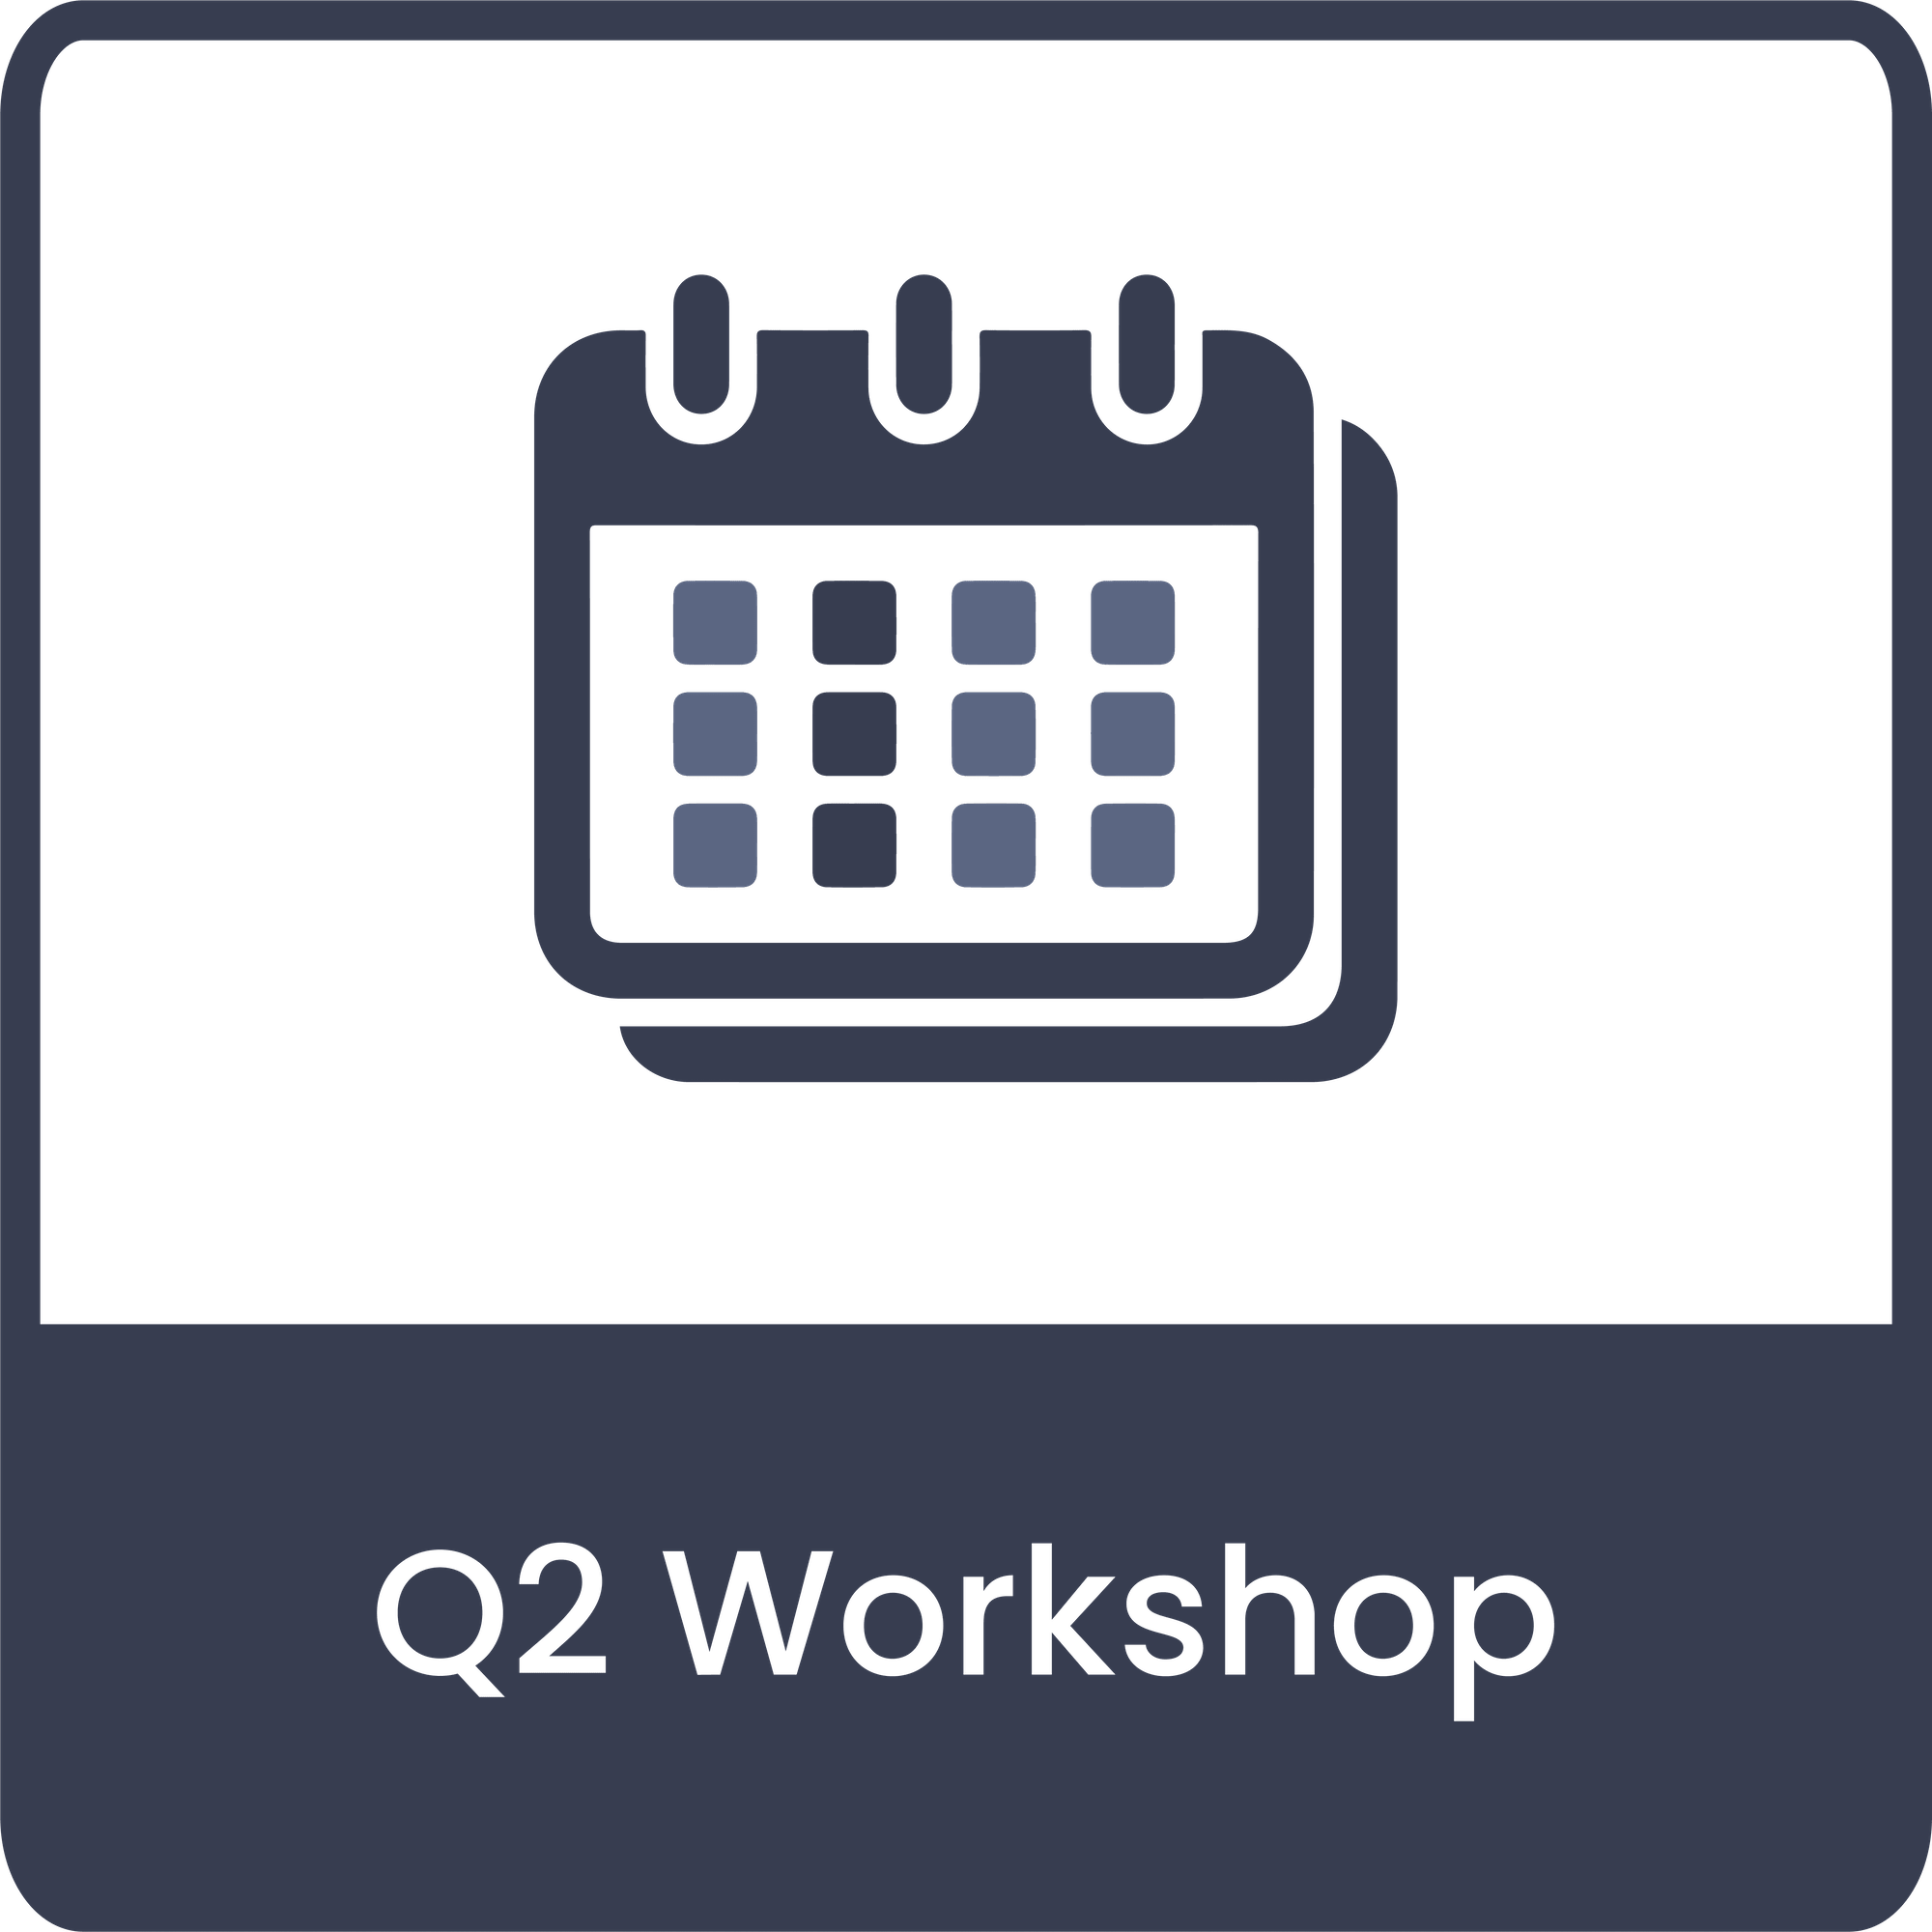 6teen30 - Workshop Icons_Q2 Workshop (1)